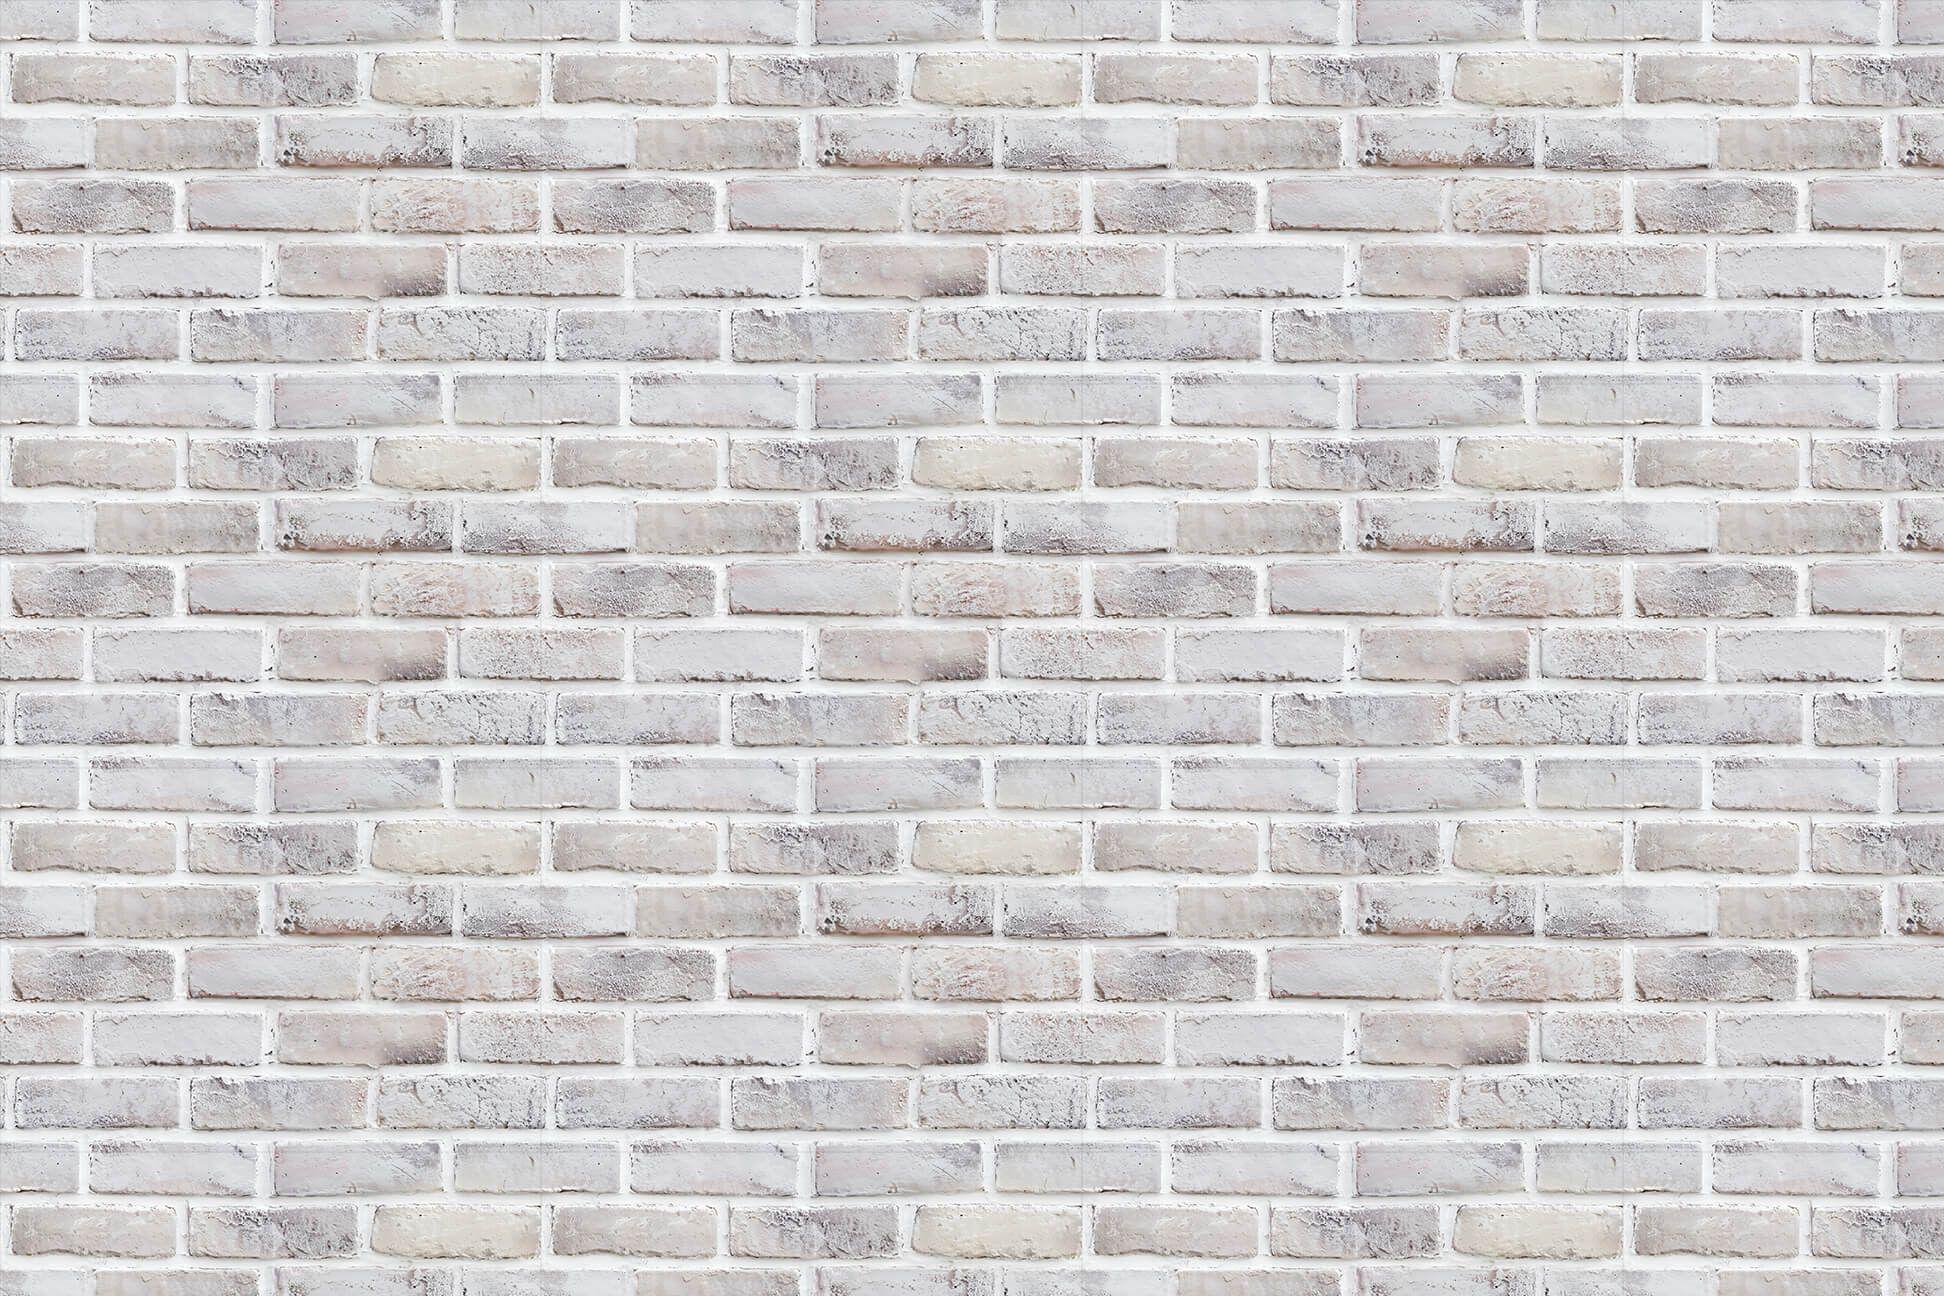 Brick Silver textured wallpaper for bedroom...LOVE IT